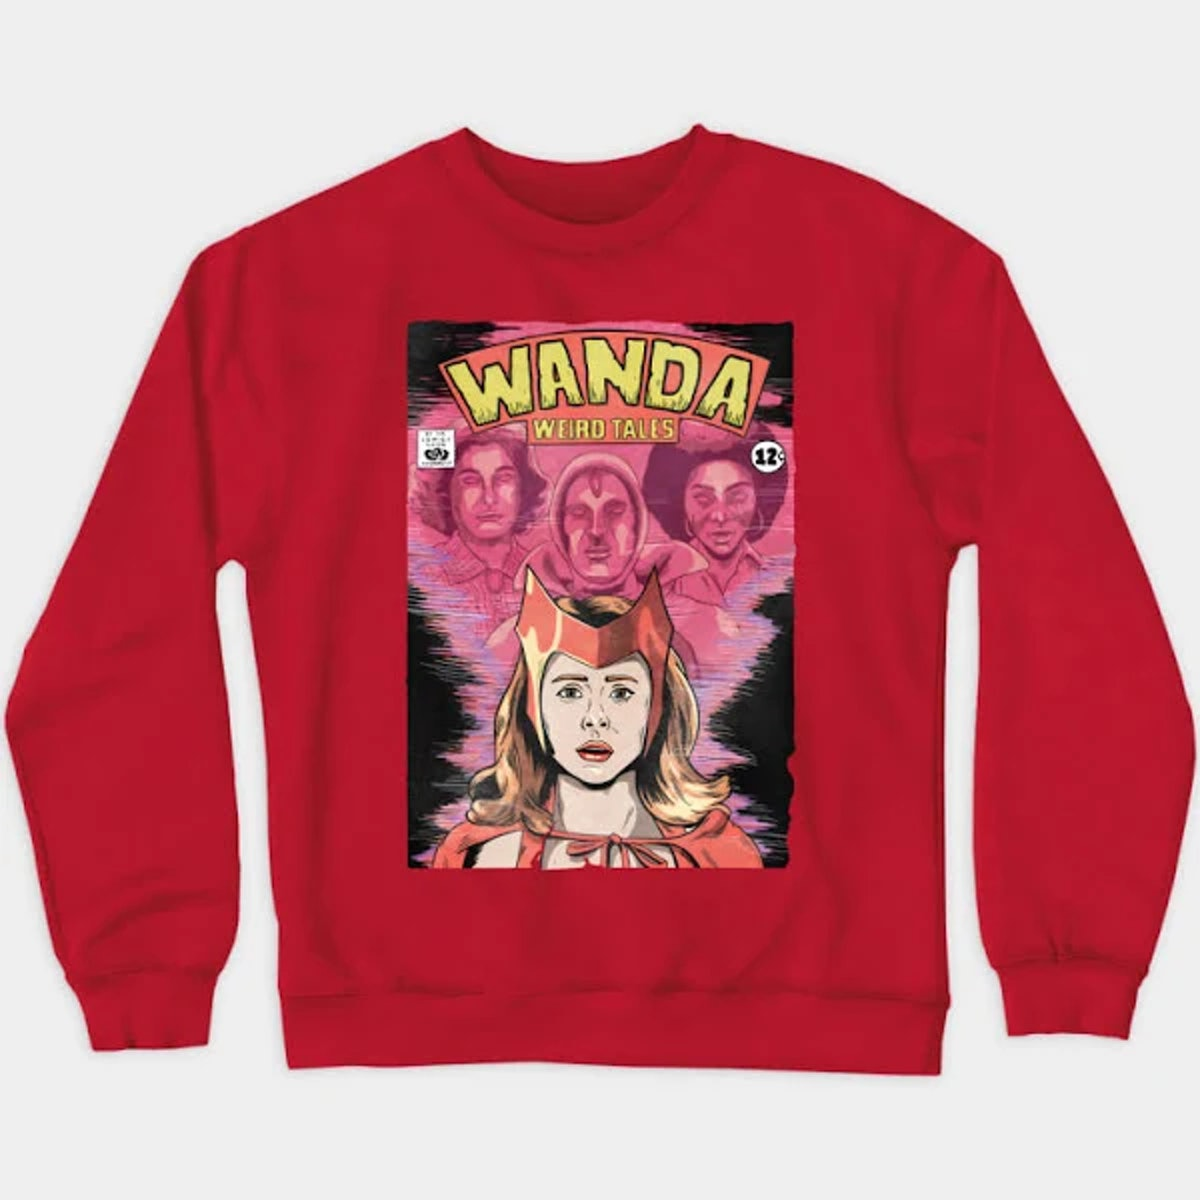 Wandavision T-Shirt Wanda Weird Tales Crewneck Sweatshirt